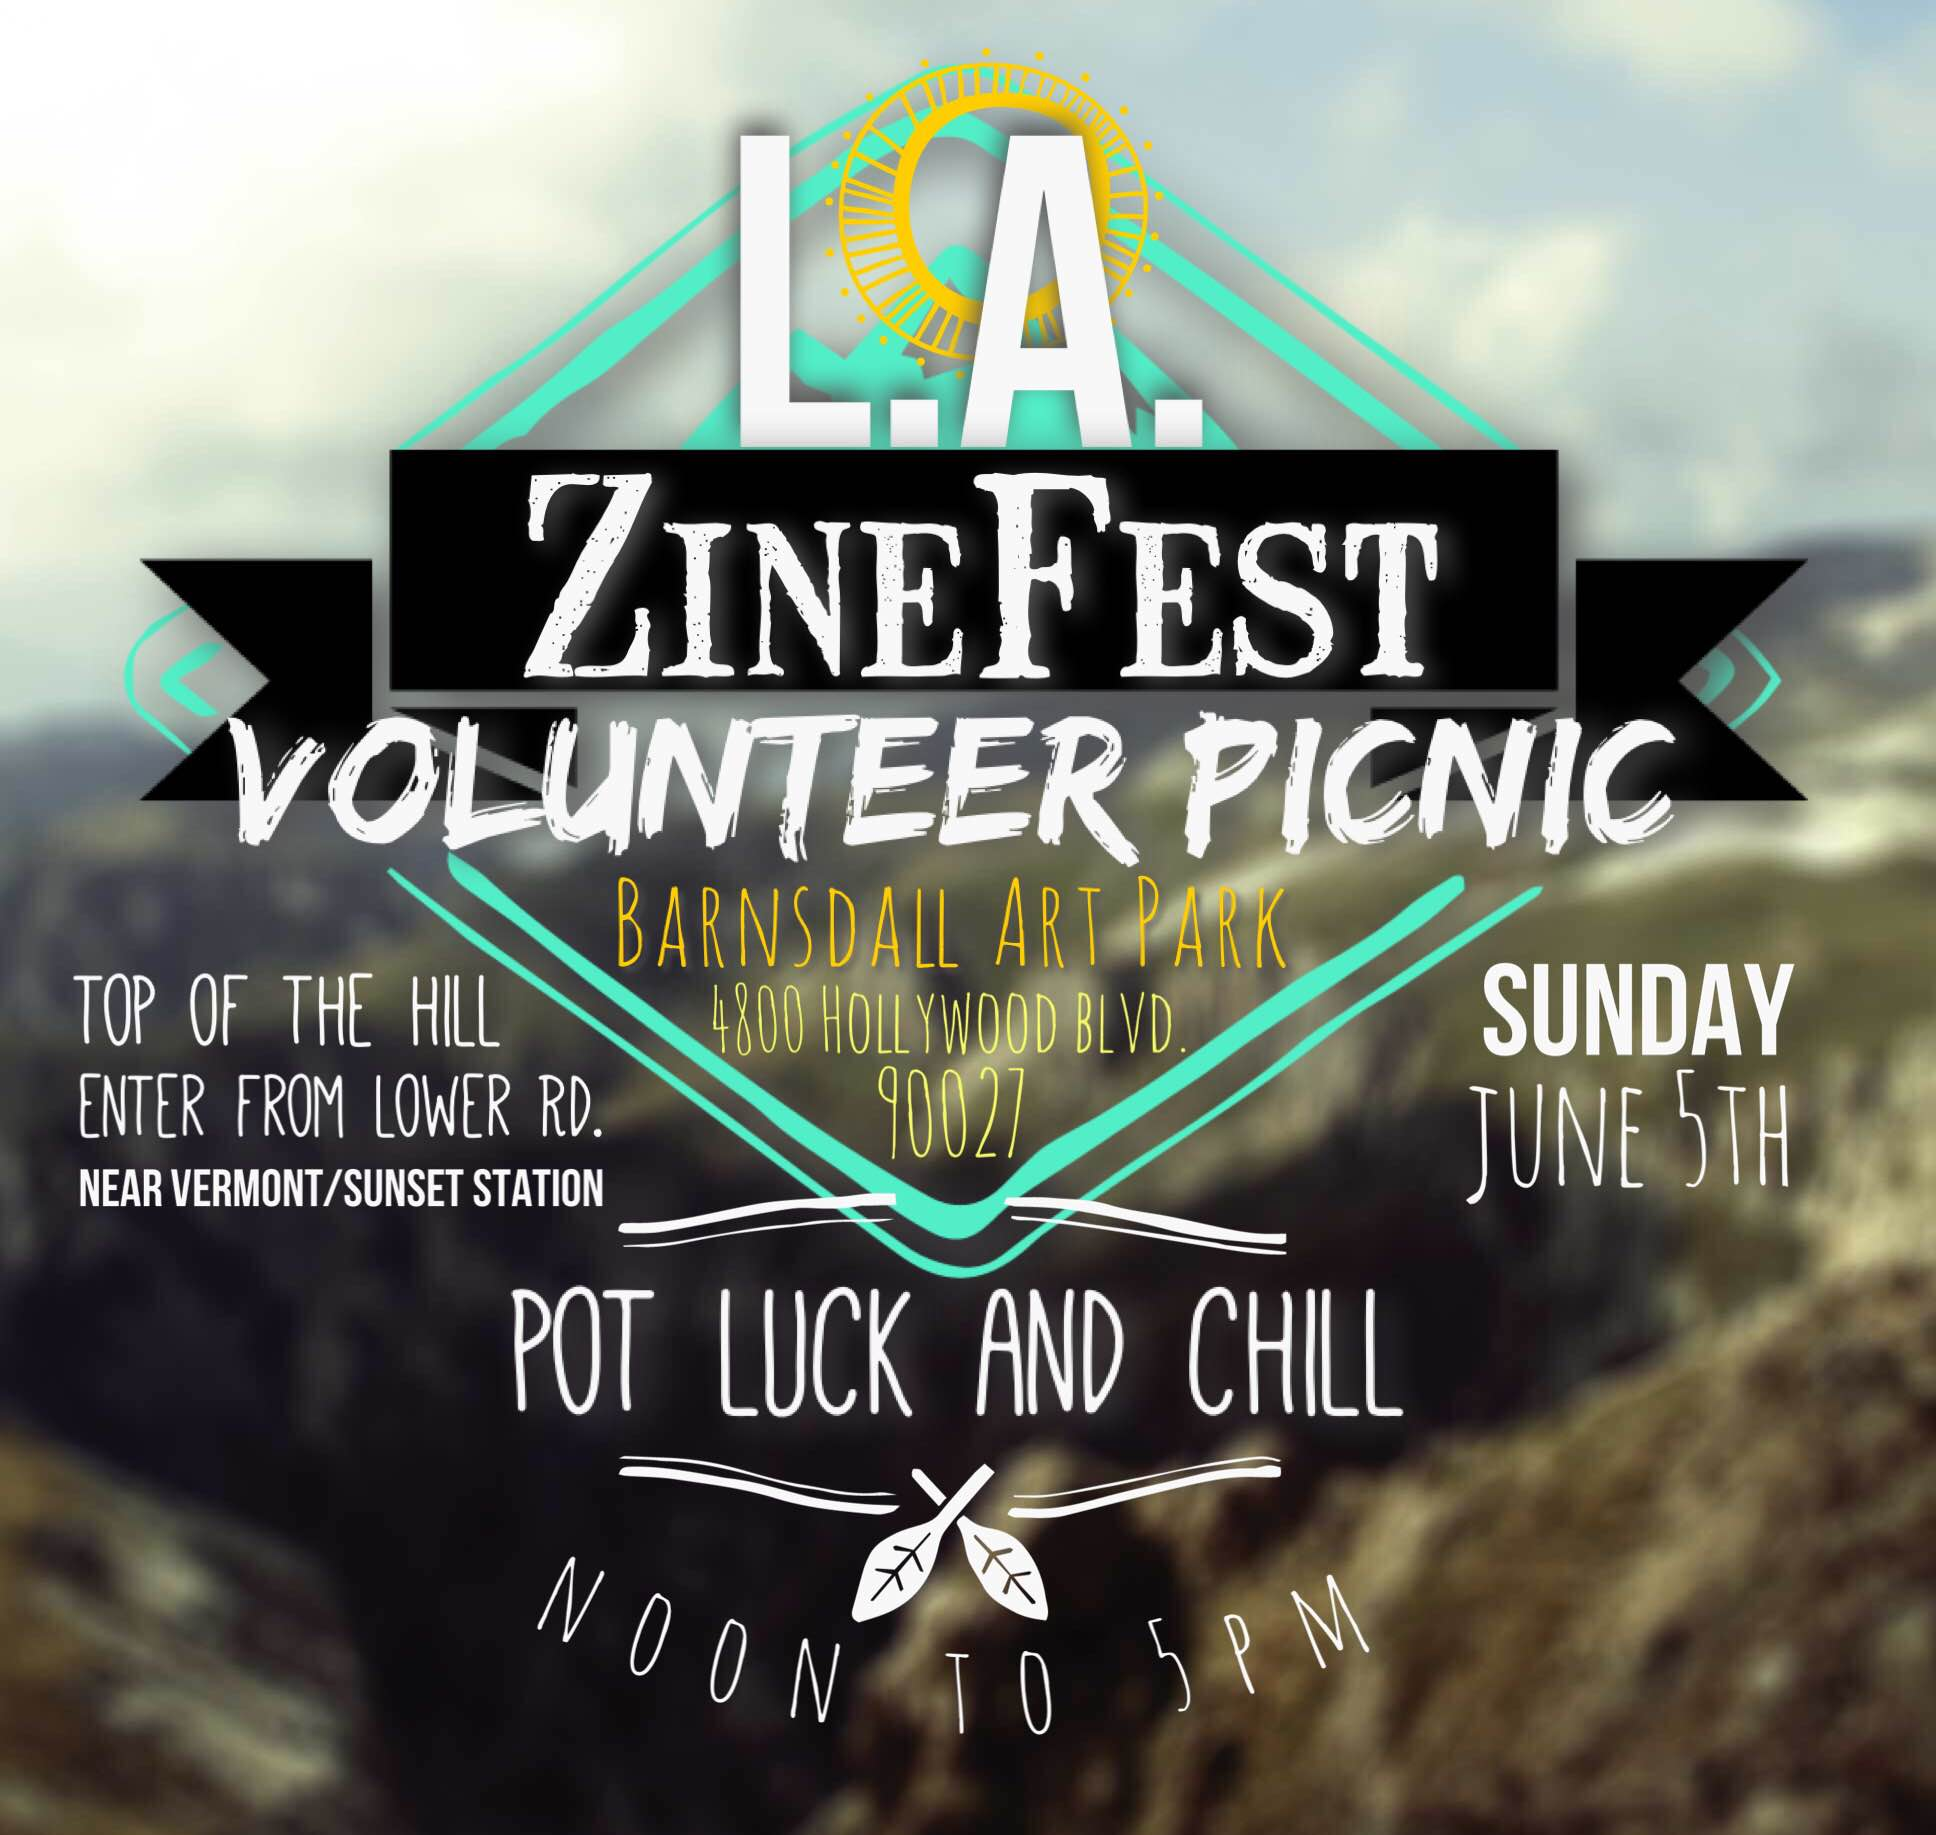 21_LAZF Picnic_June 2016.JPG